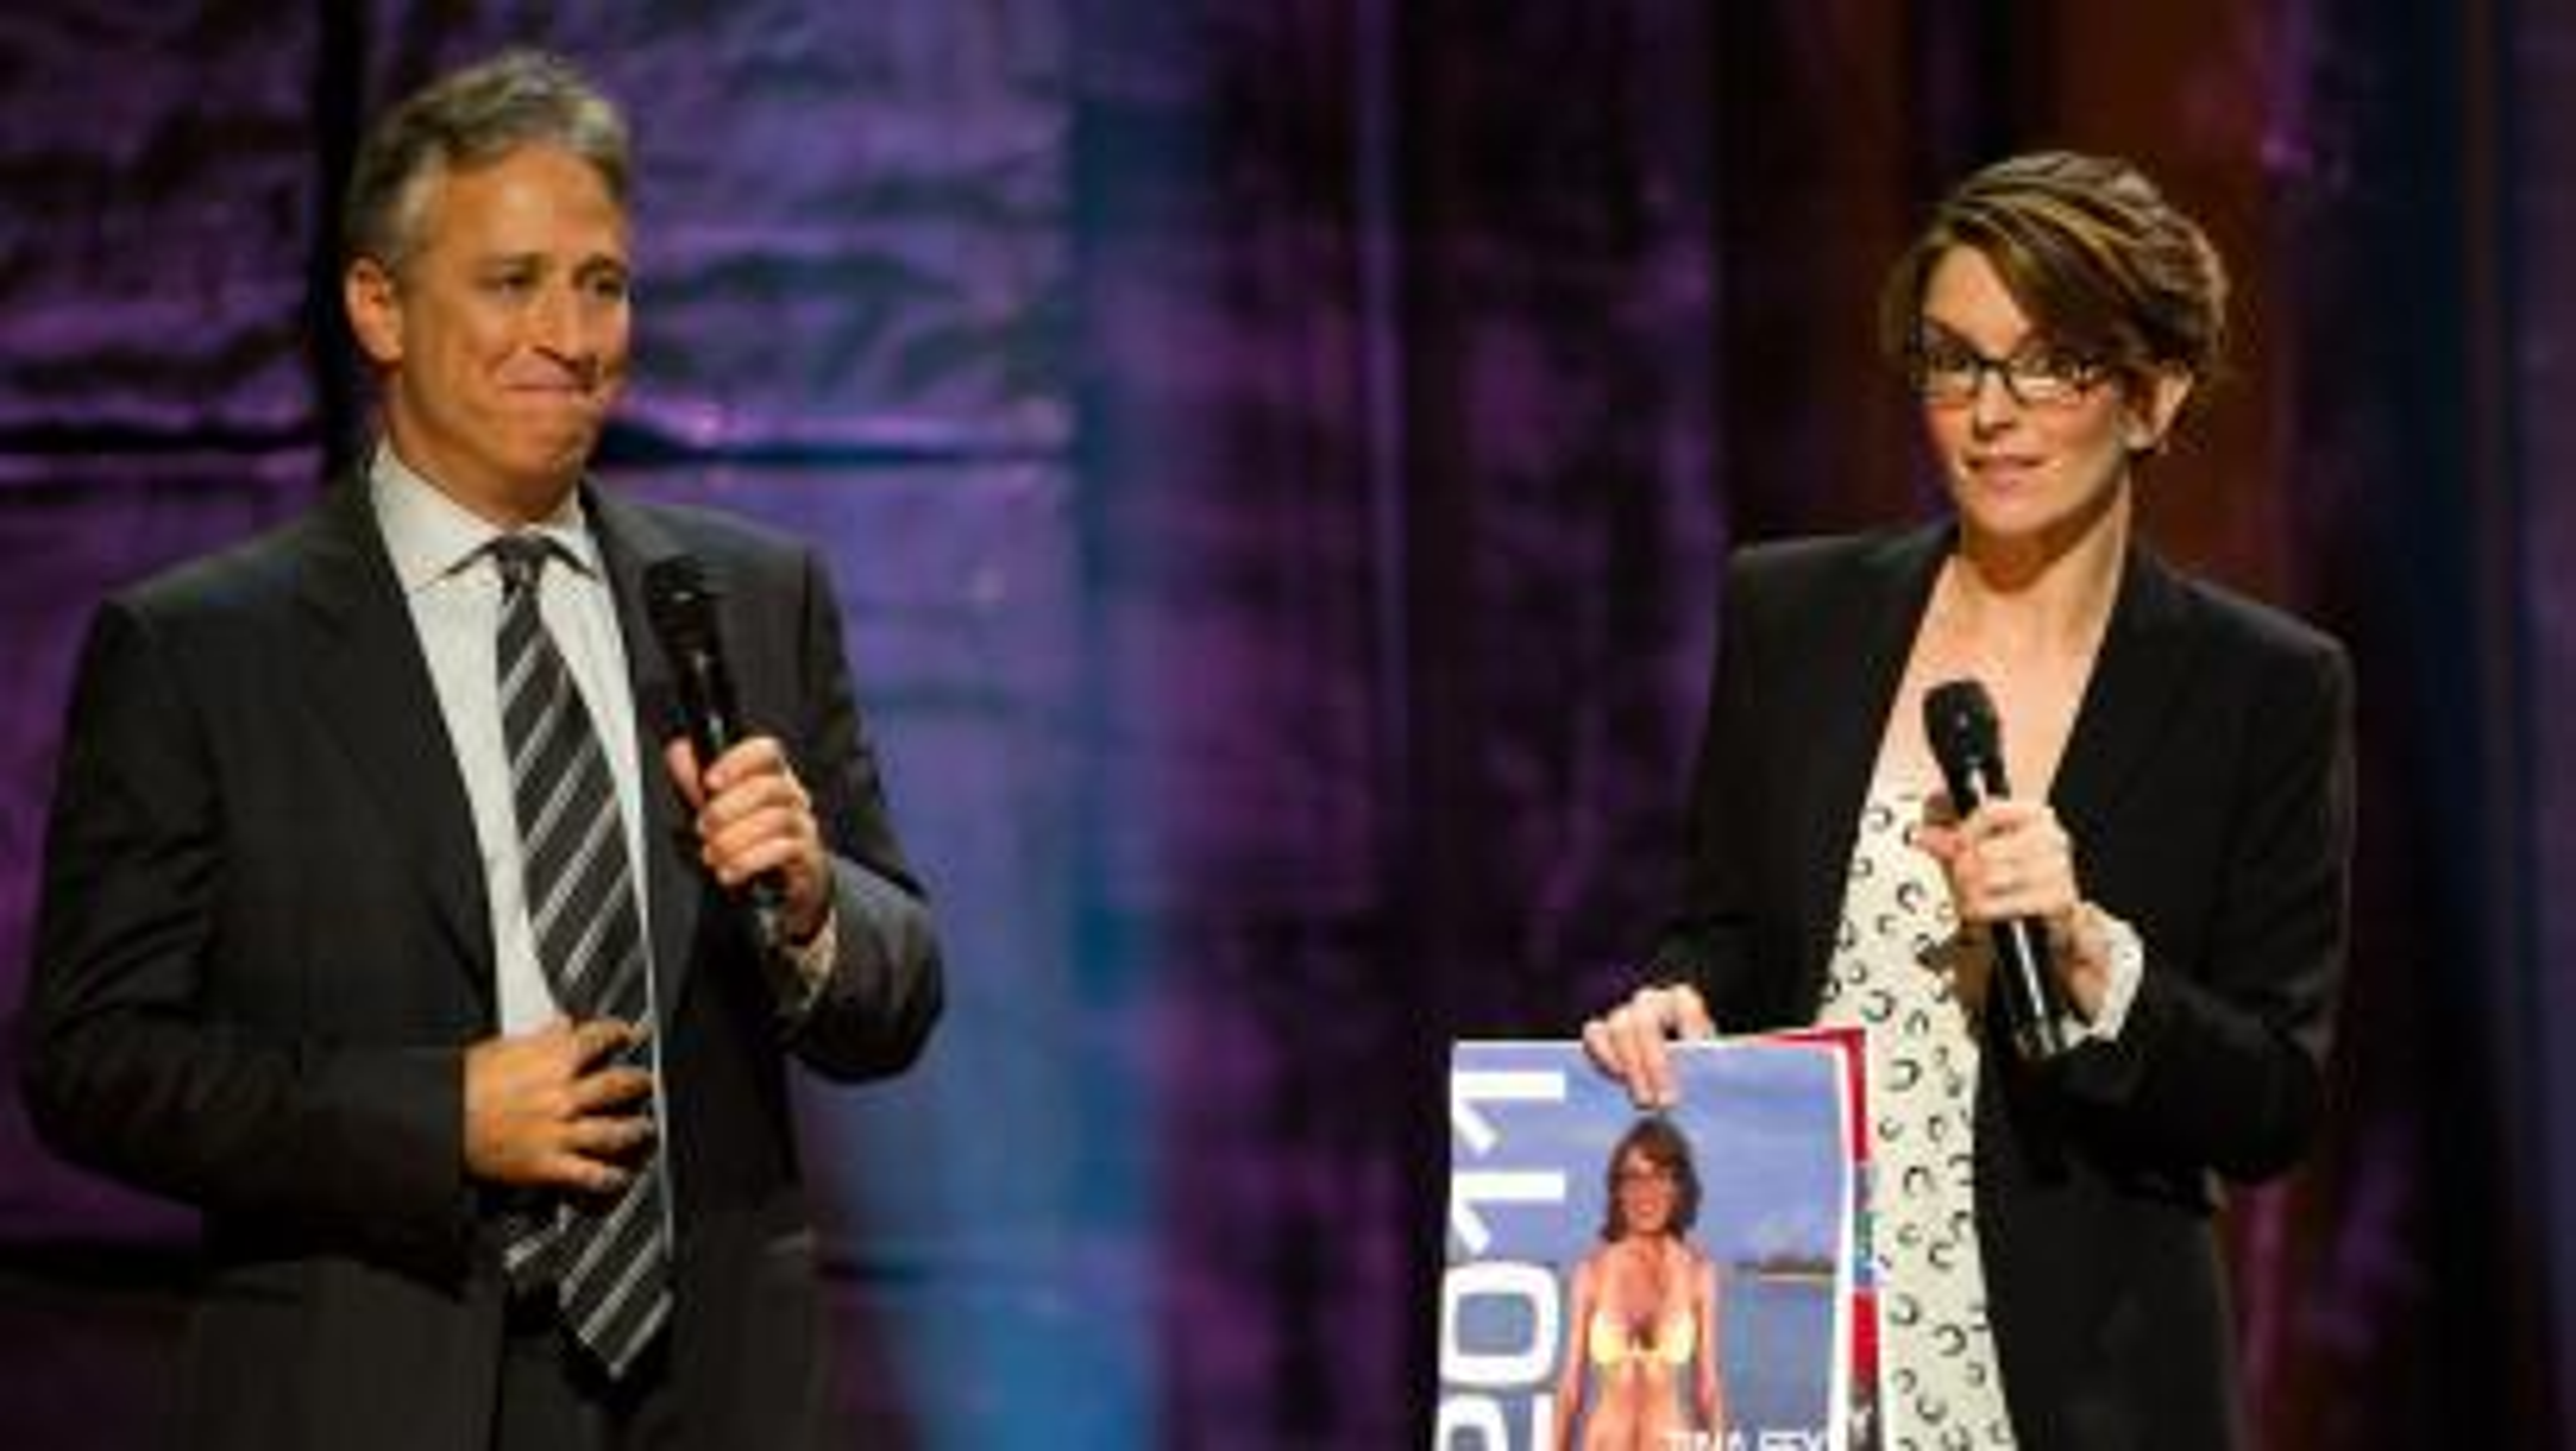 Jon Stewart and Tina Fey